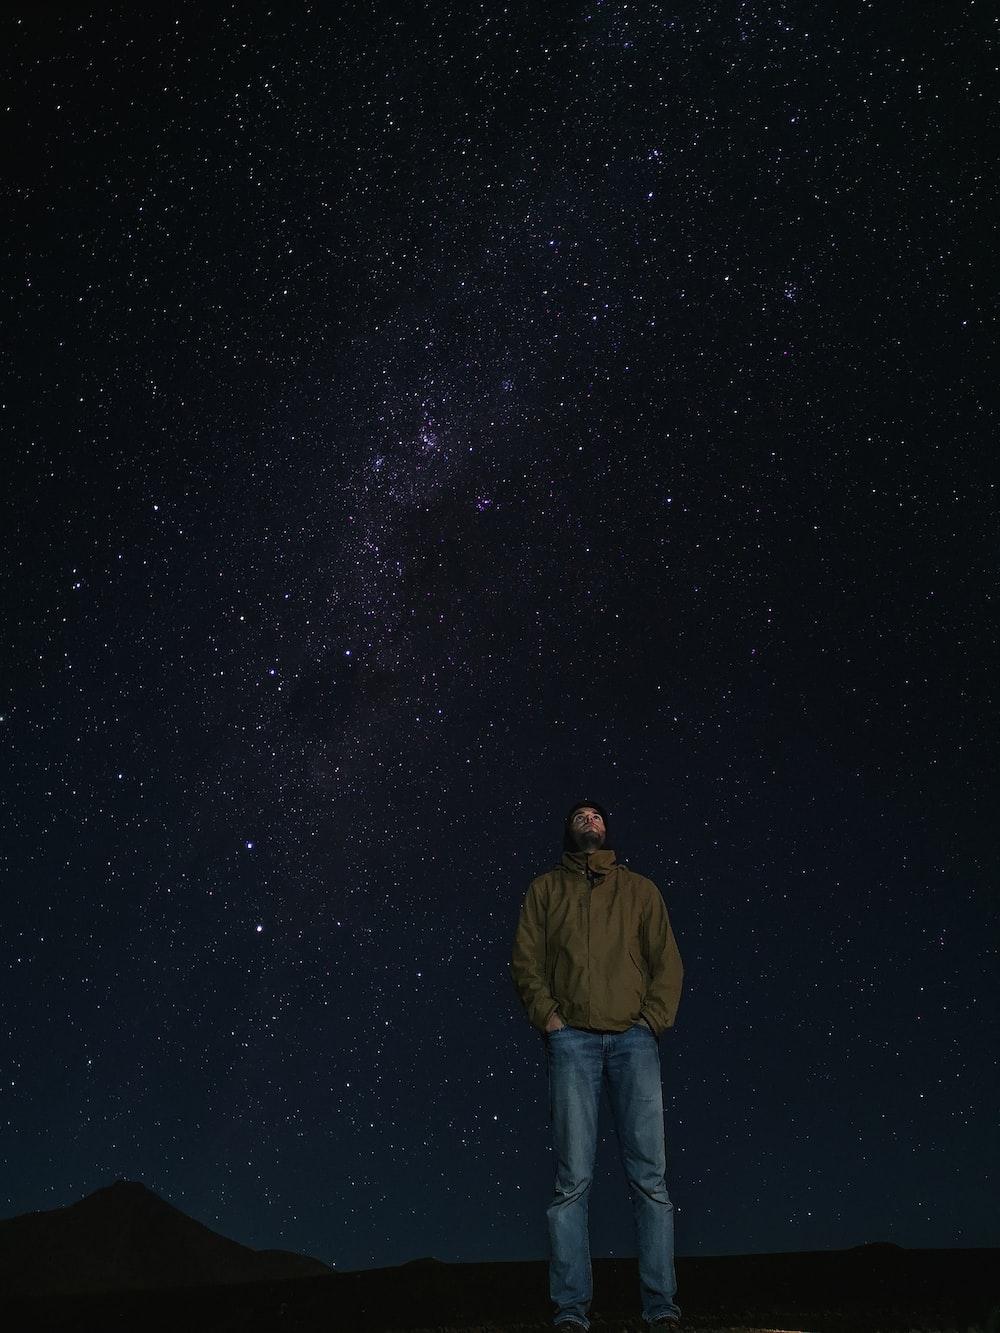 man in brown jacket standing under starry night